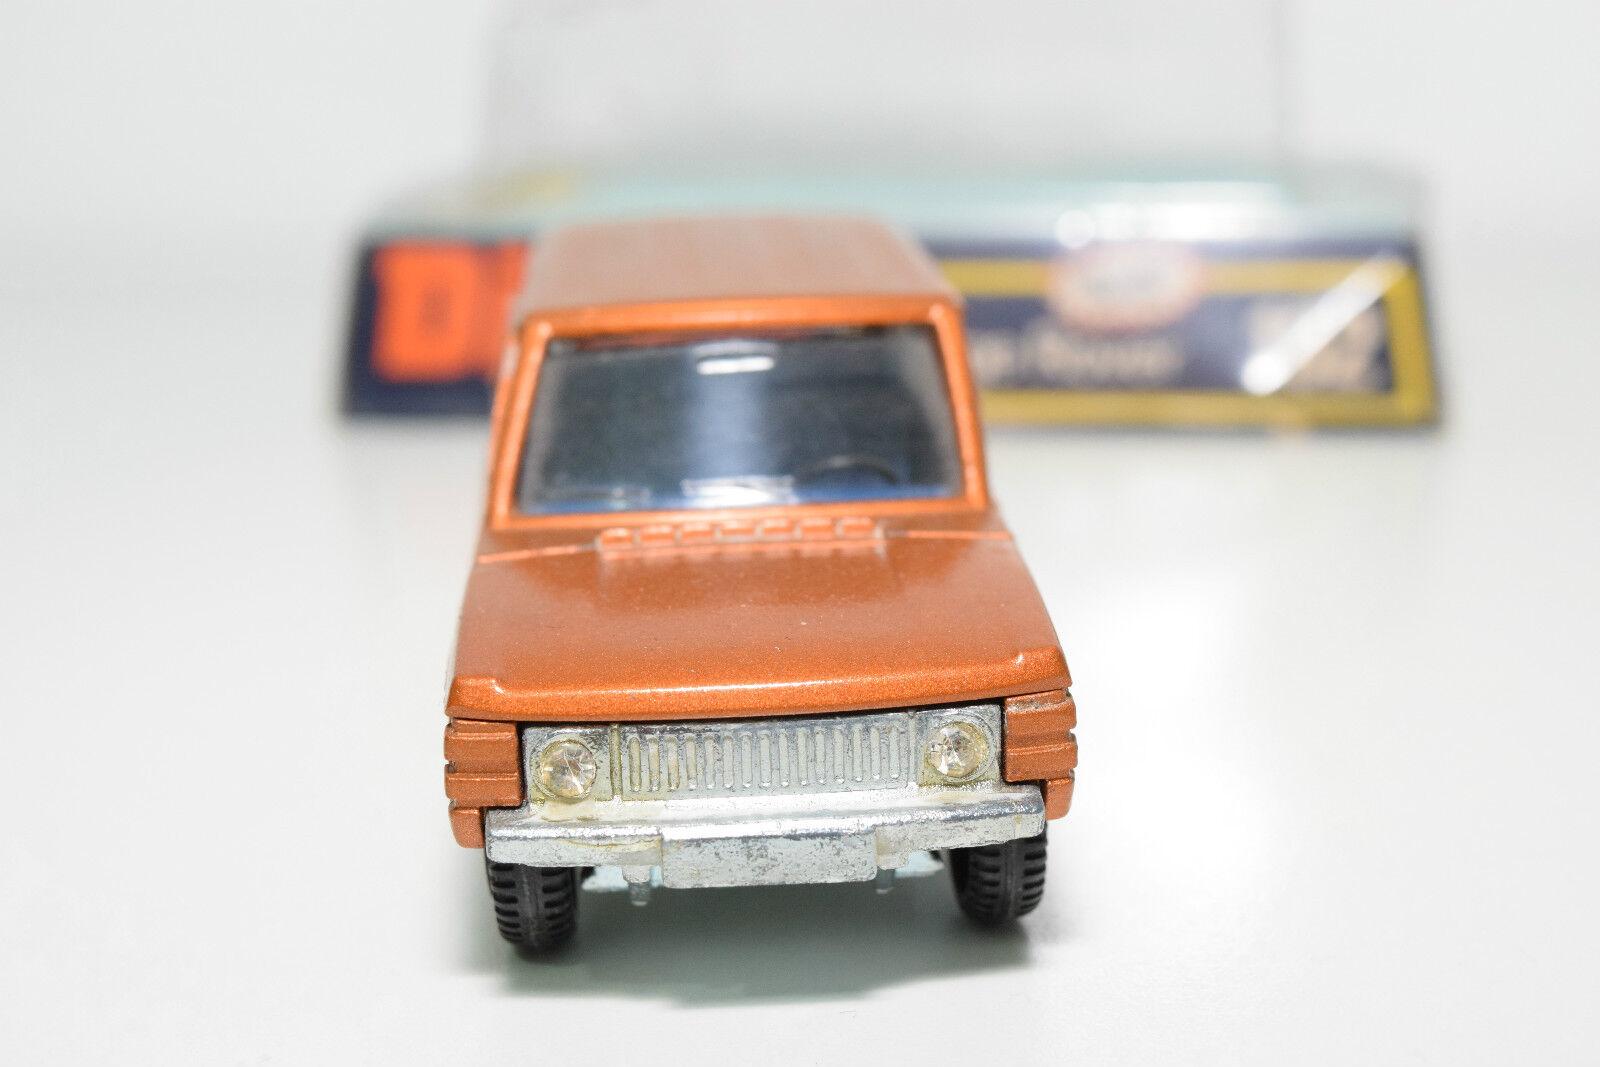 DINKY TOYS 192 RANGE ROVER METALLIC BRONZE MINT BOXED BOXED BOXED RARE SELTEN RARO 7a6c09